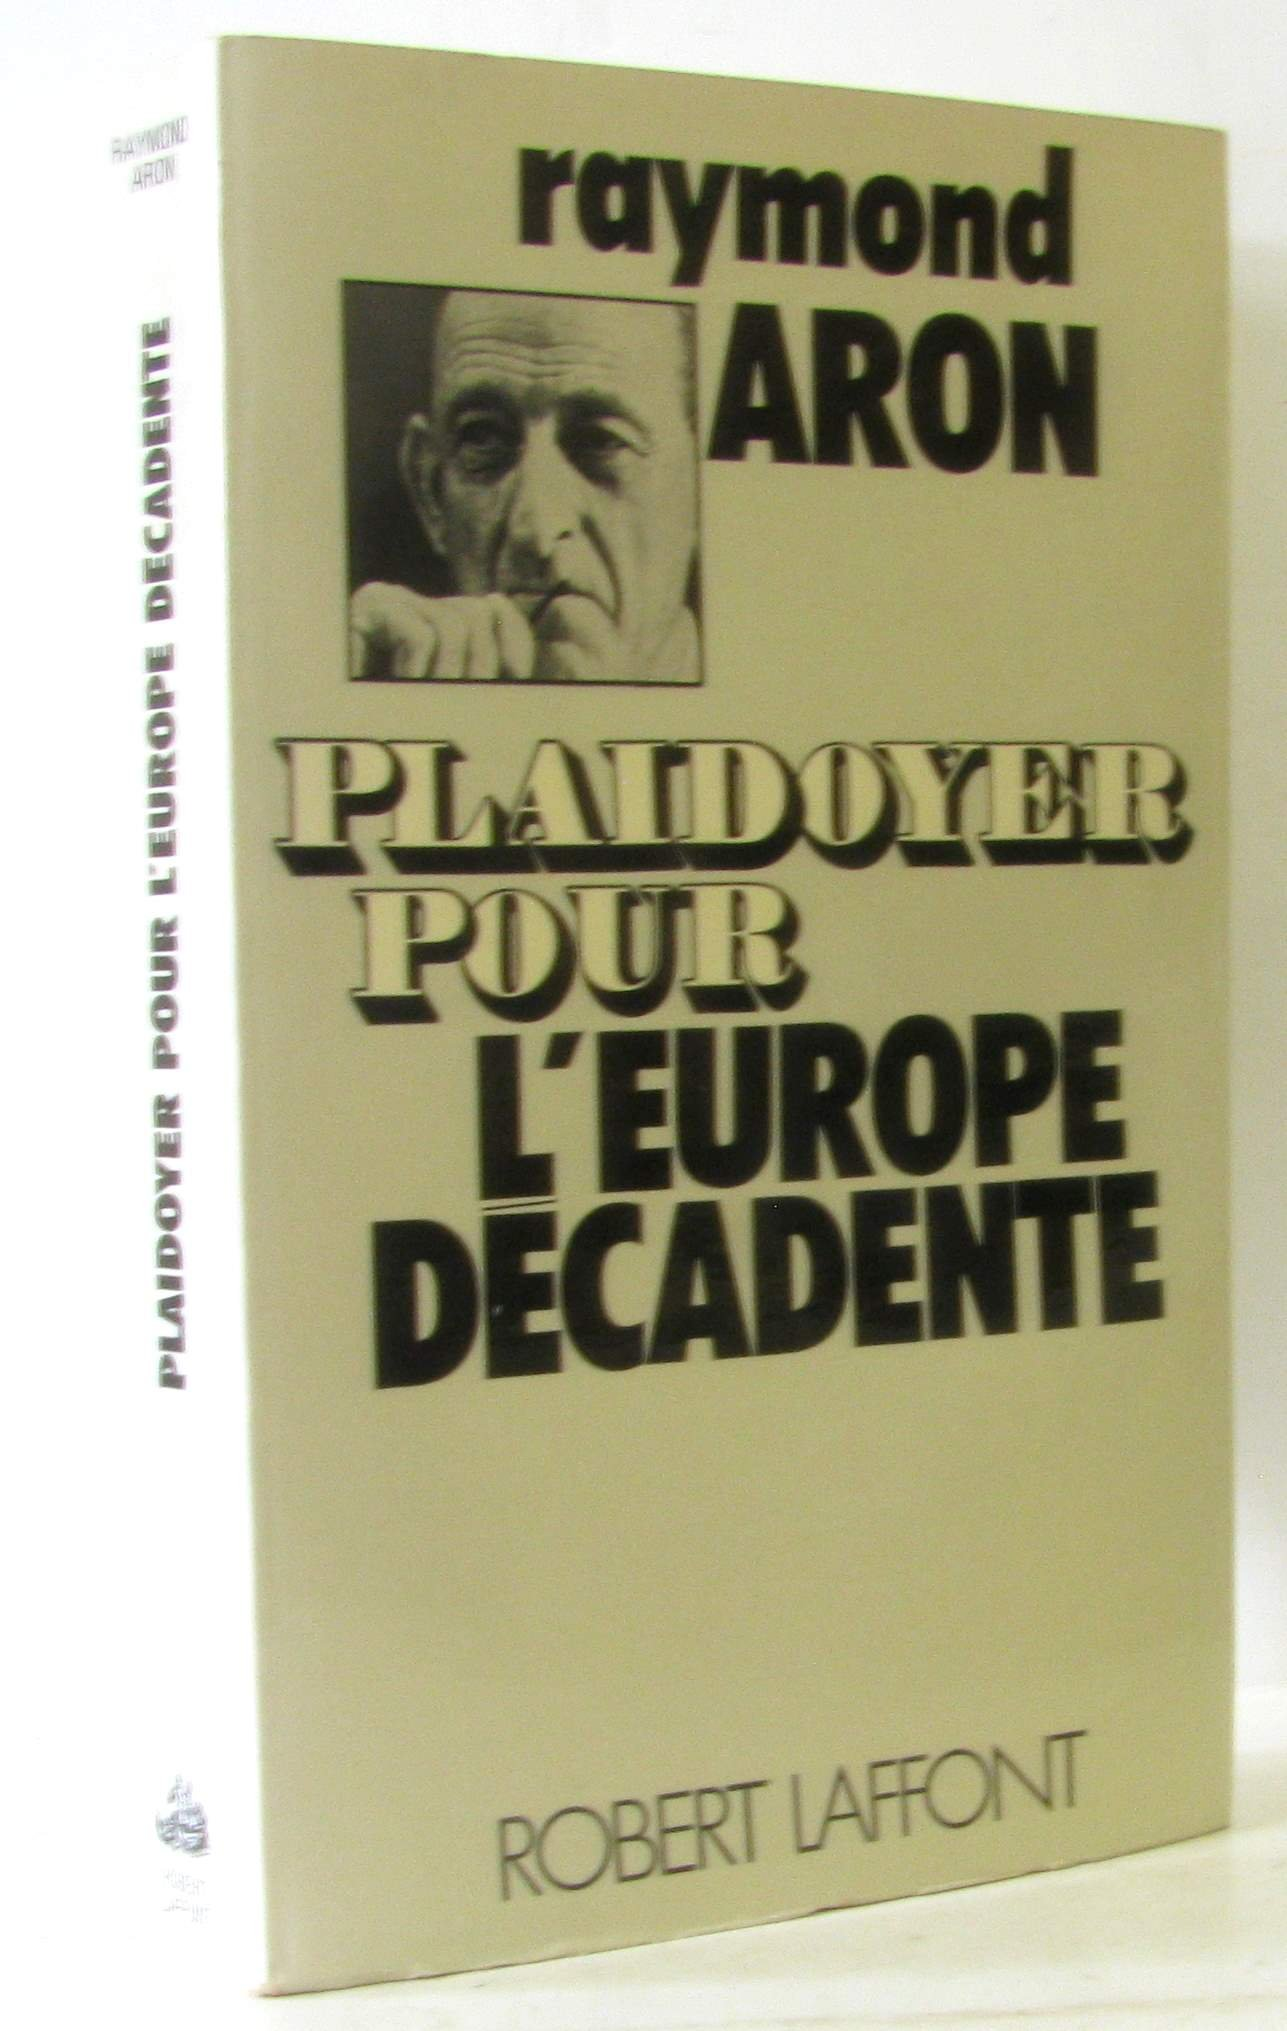 Plaidoyer pour l'Europe décadente Broché – 1977 Aron Raymond Robert Laffont B0000DSUK0 47126